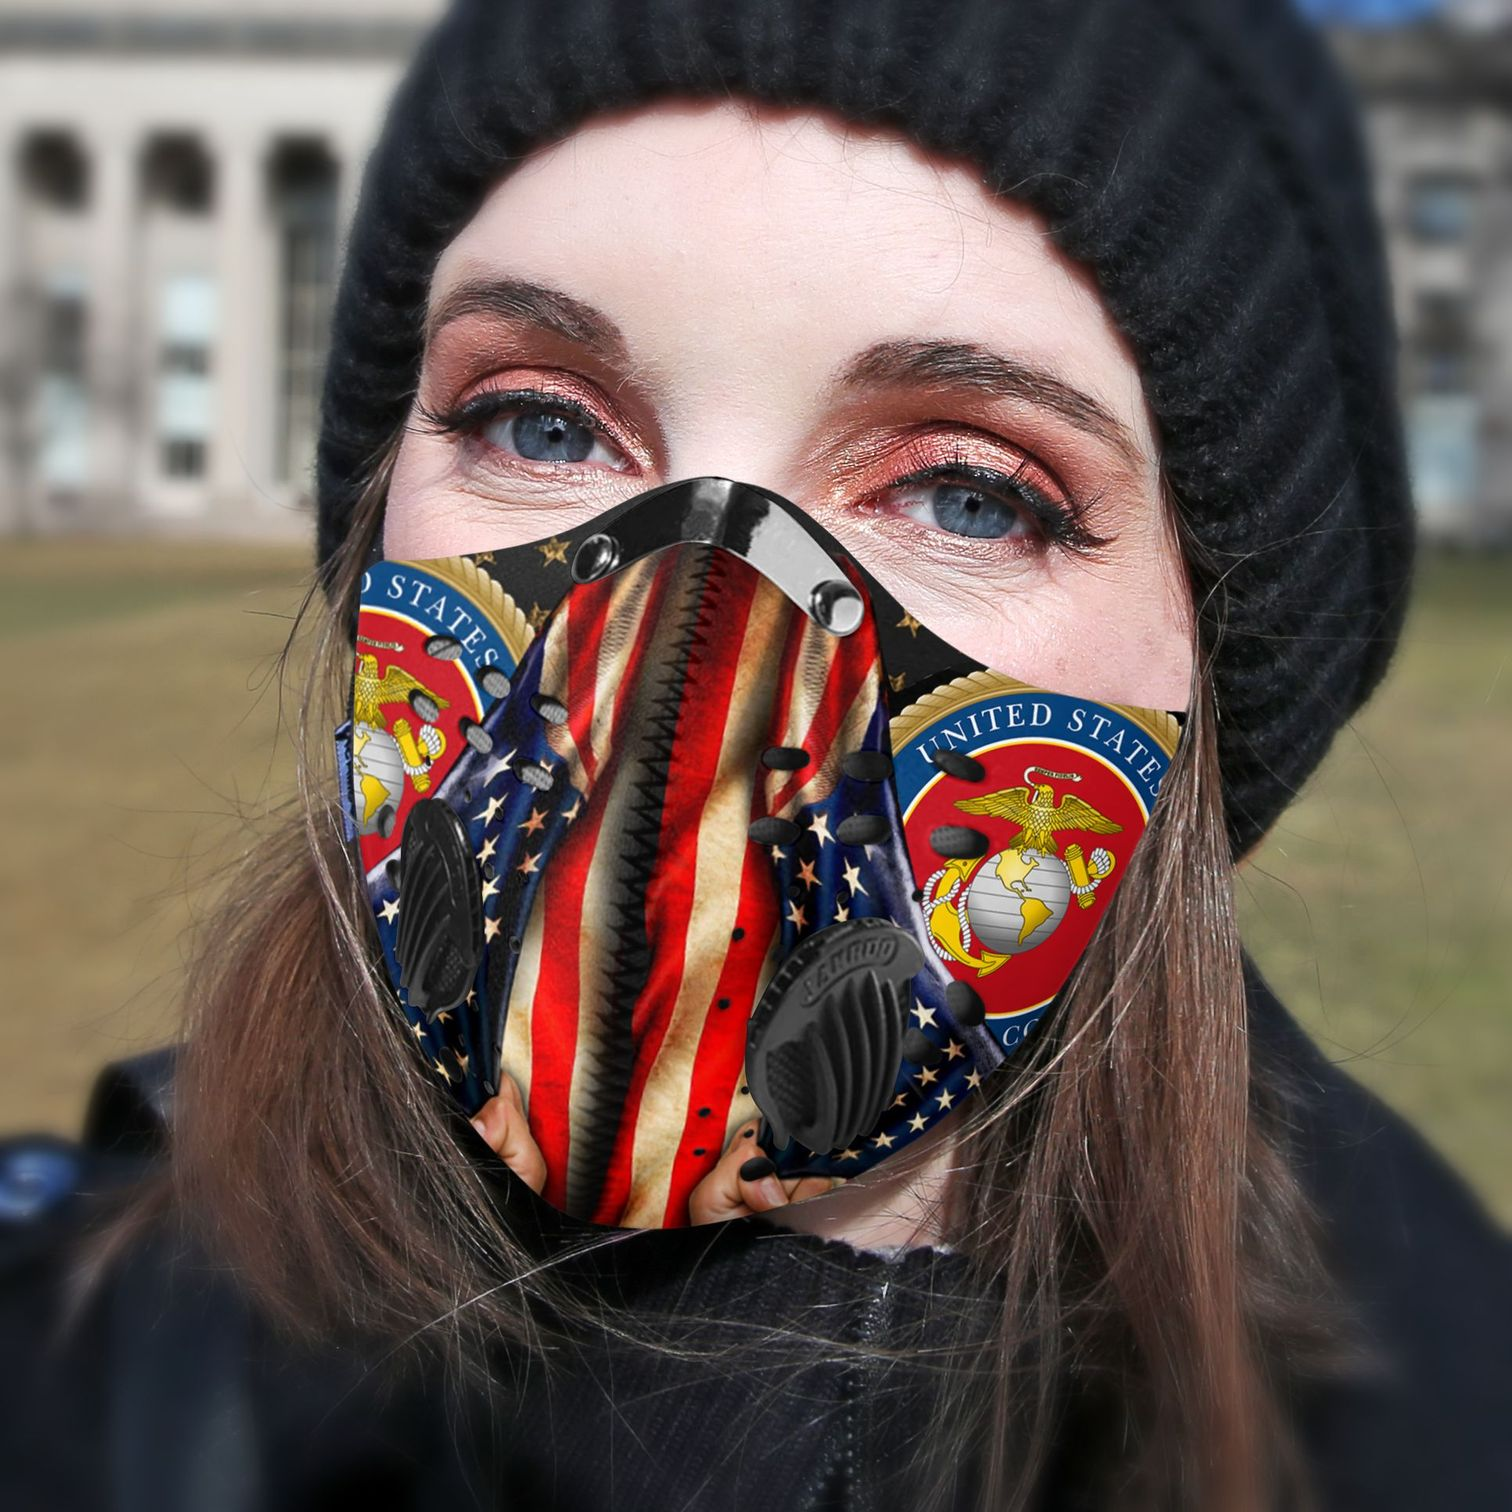 Proud marine corps carbon pm 2,5 face mask 3